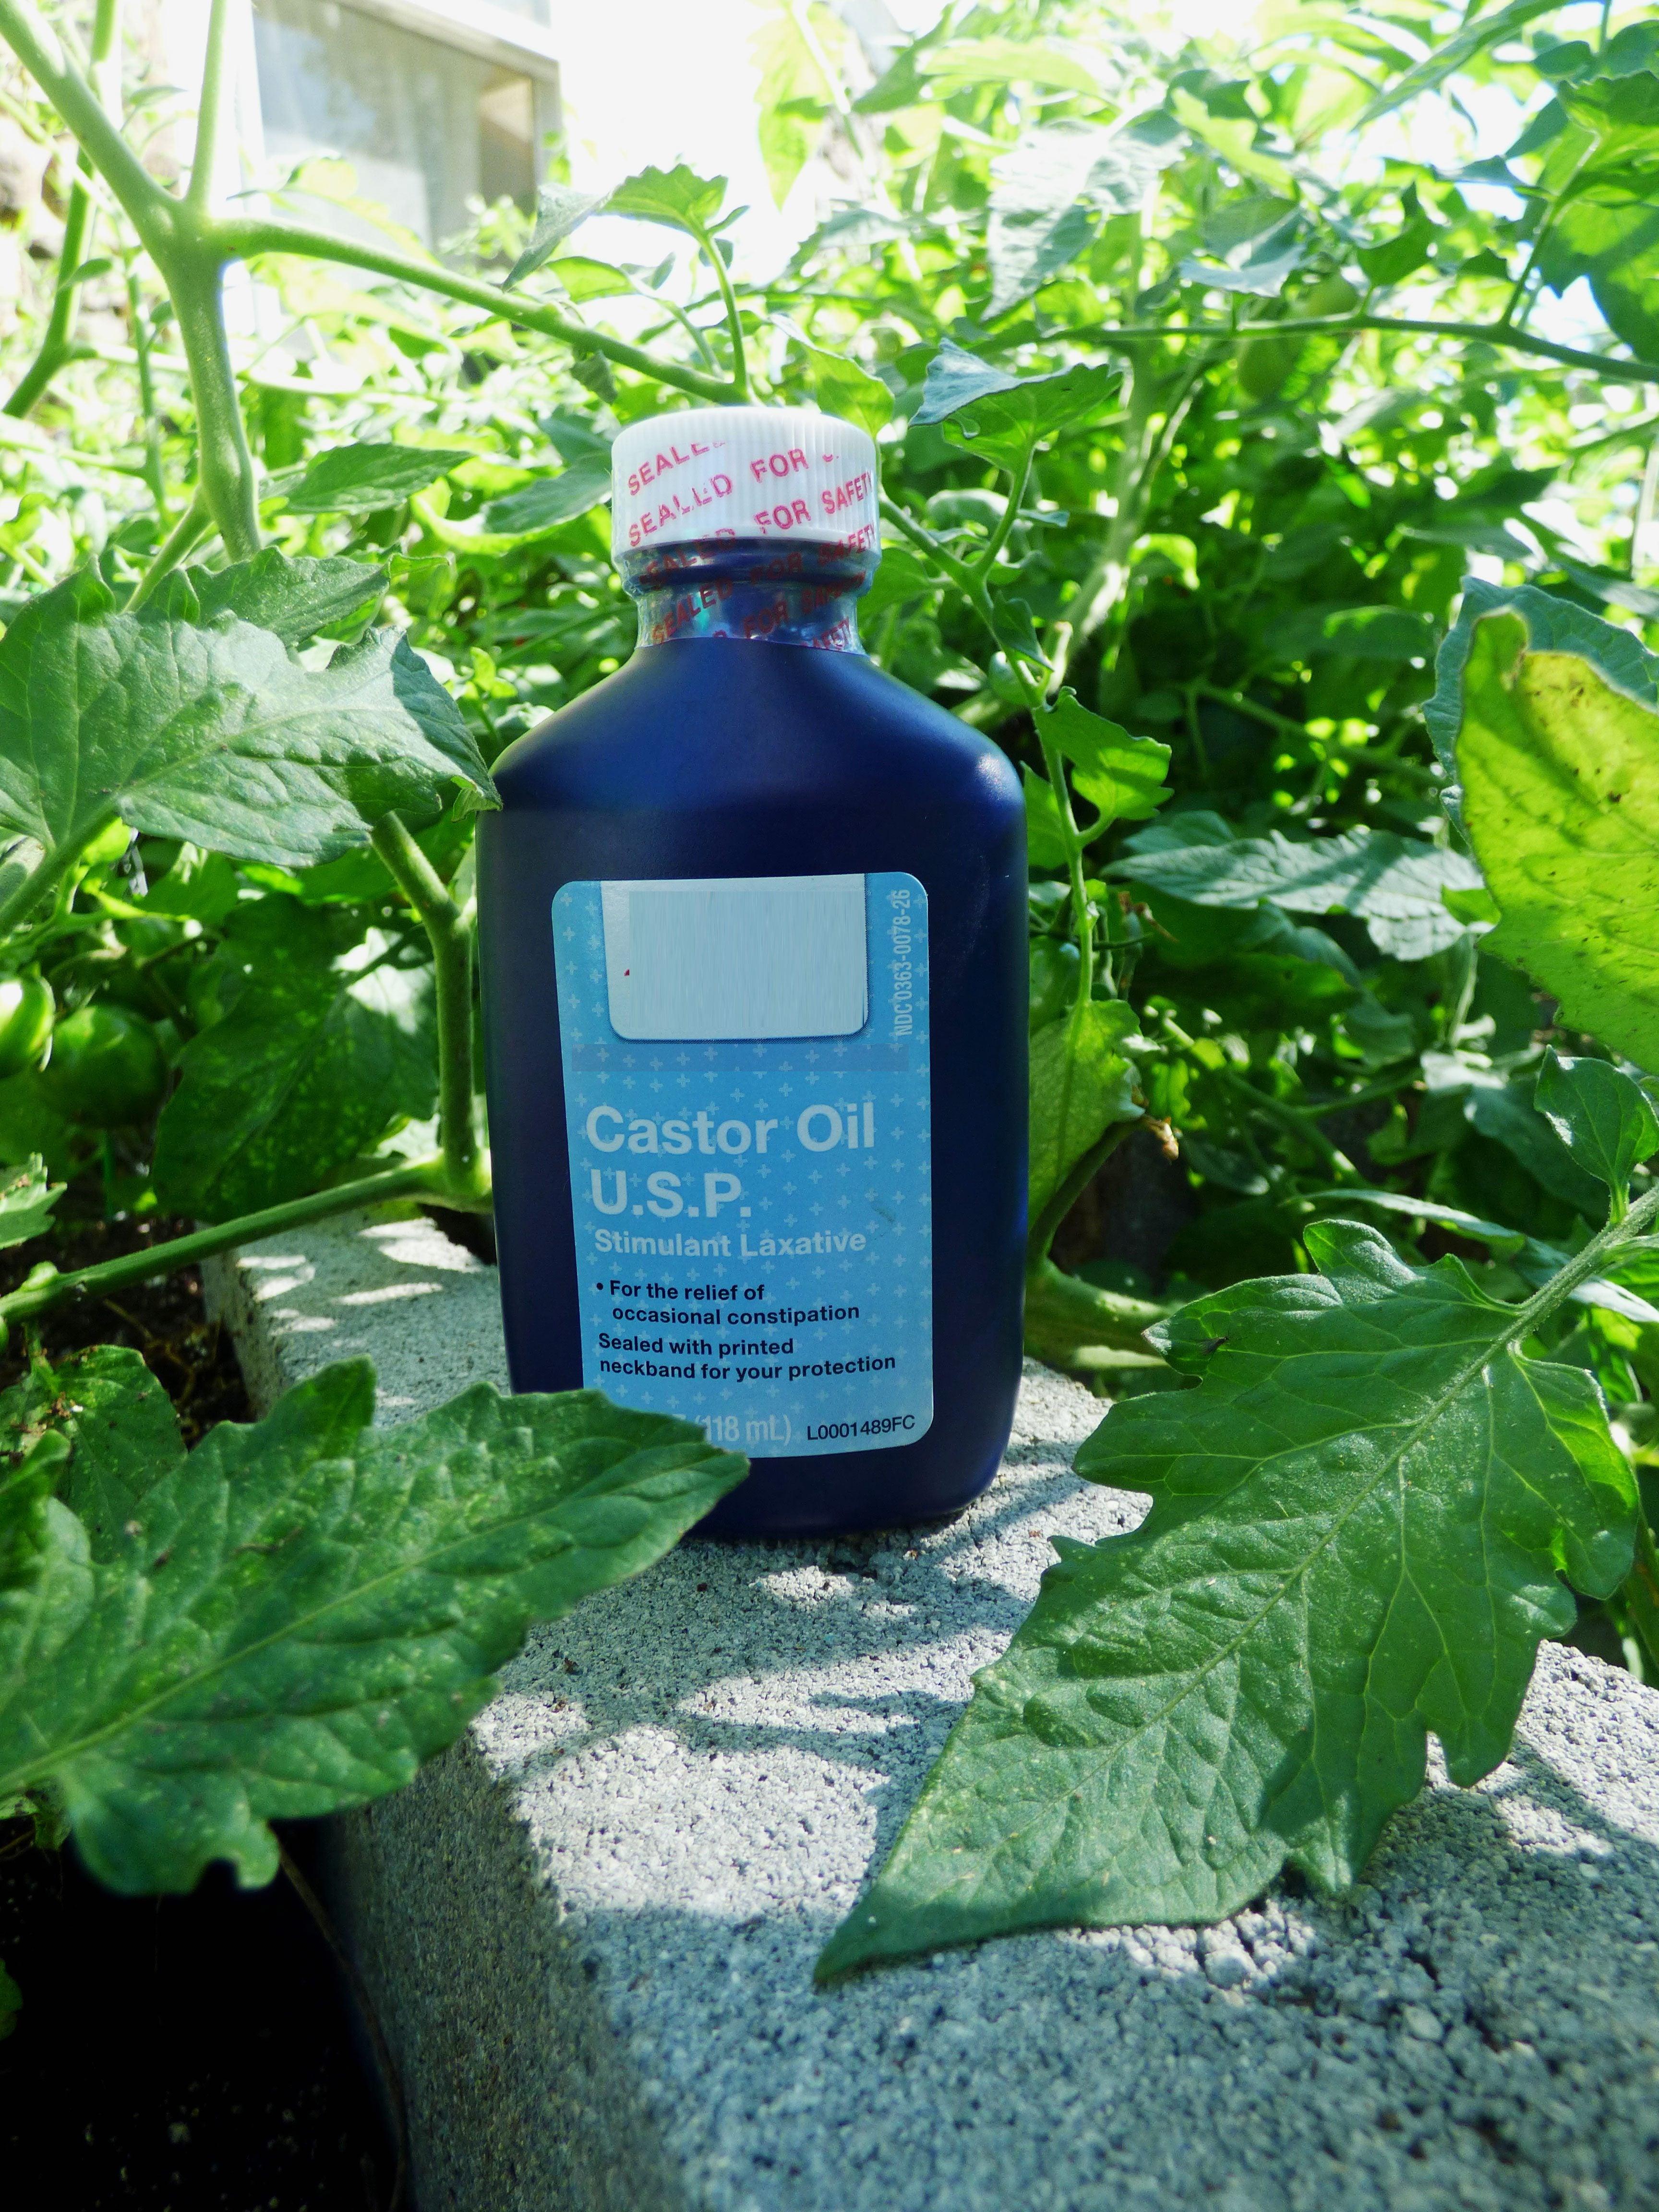 castor oil - Is Castor Oil Safe For Vegetable Gardens